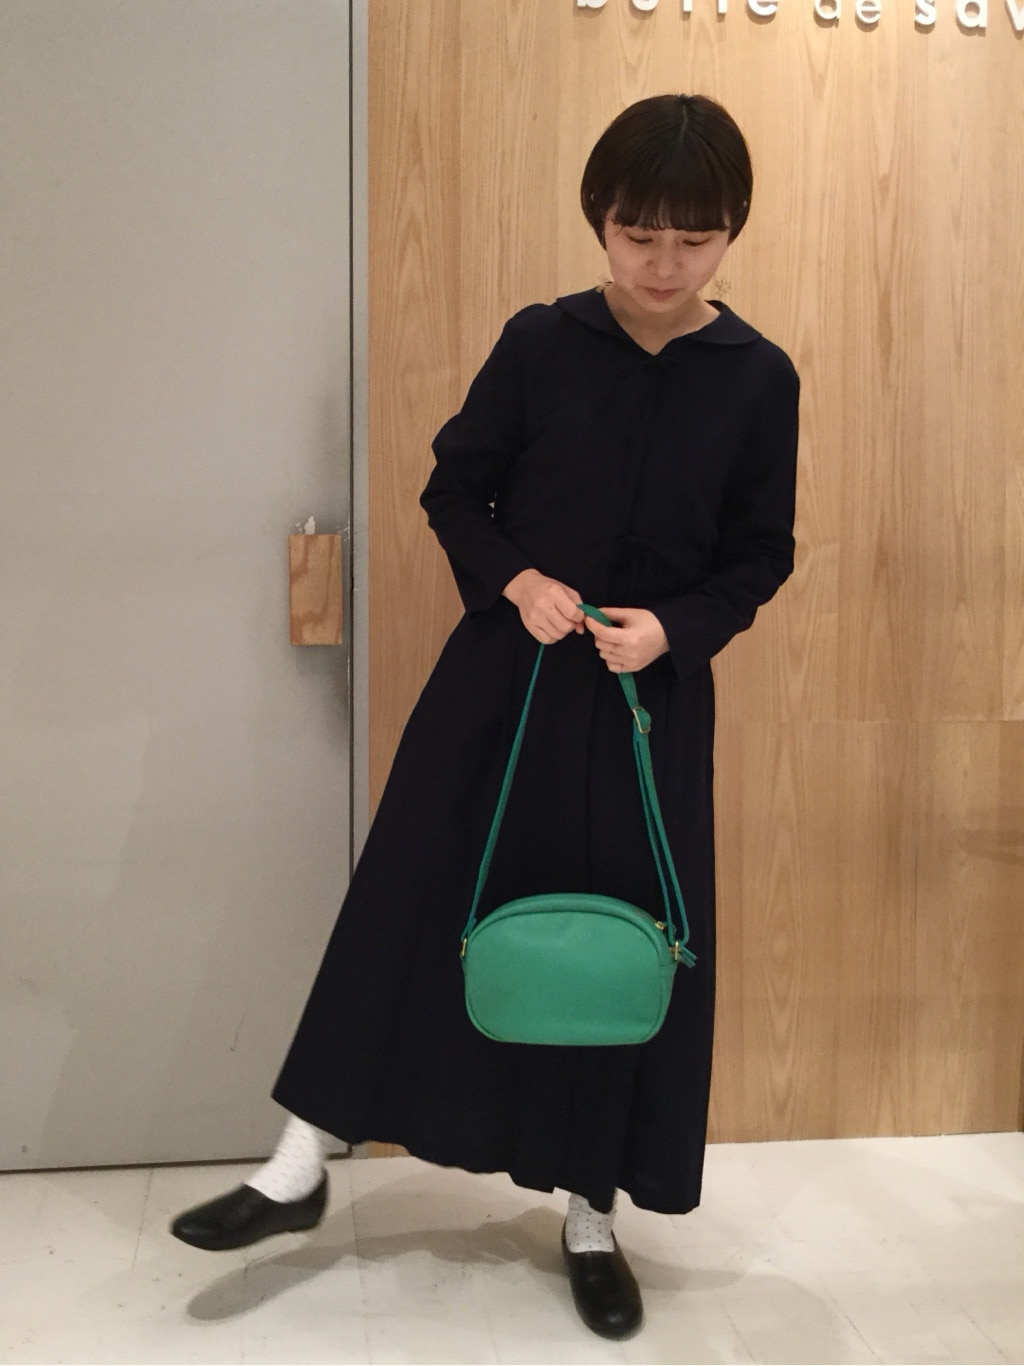 bulle de savon なんばシティ 身長:149cm 2020.03.04